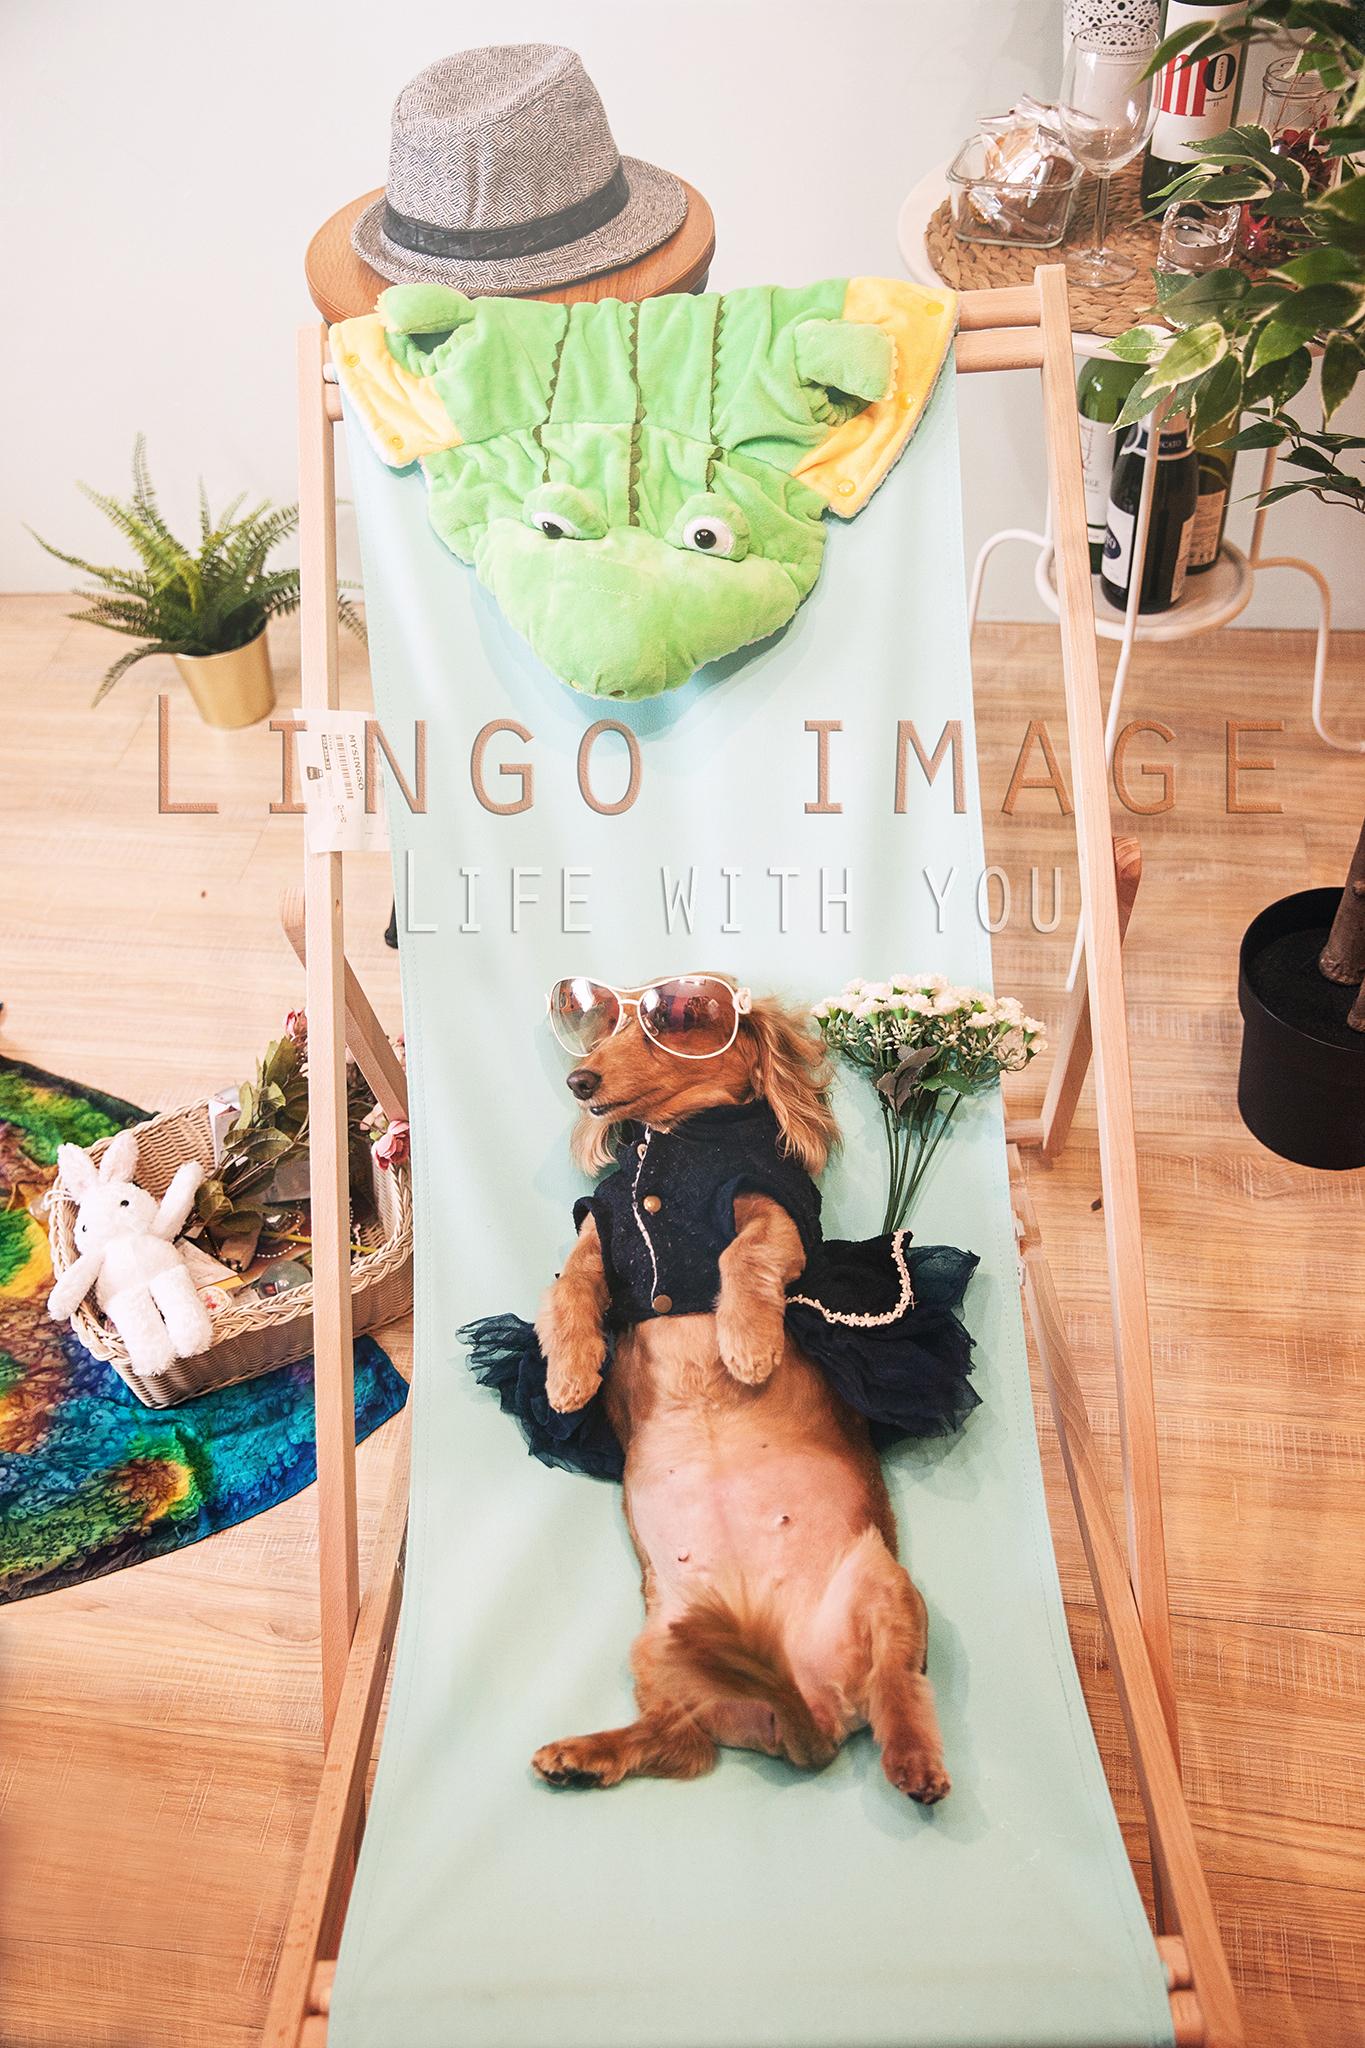 Lingo image_寵物46